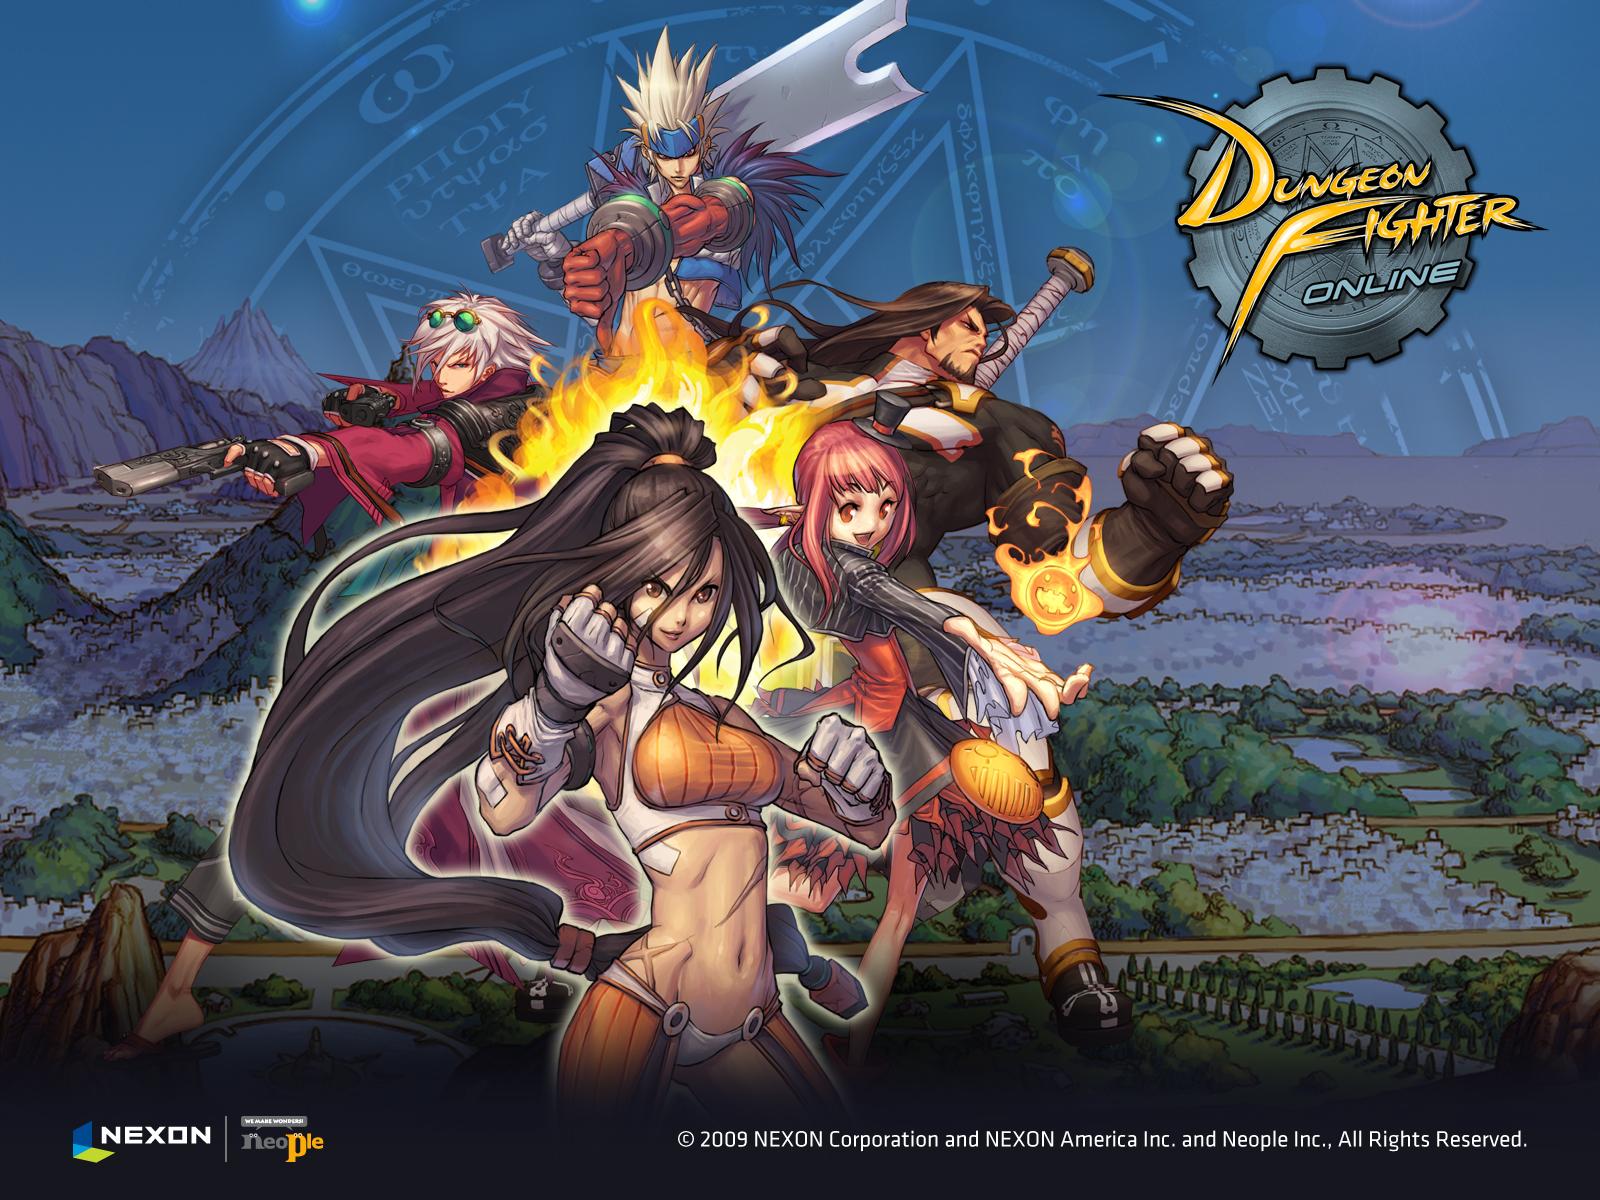 Dungeon Fighter Online Wallpapers 1600x1200